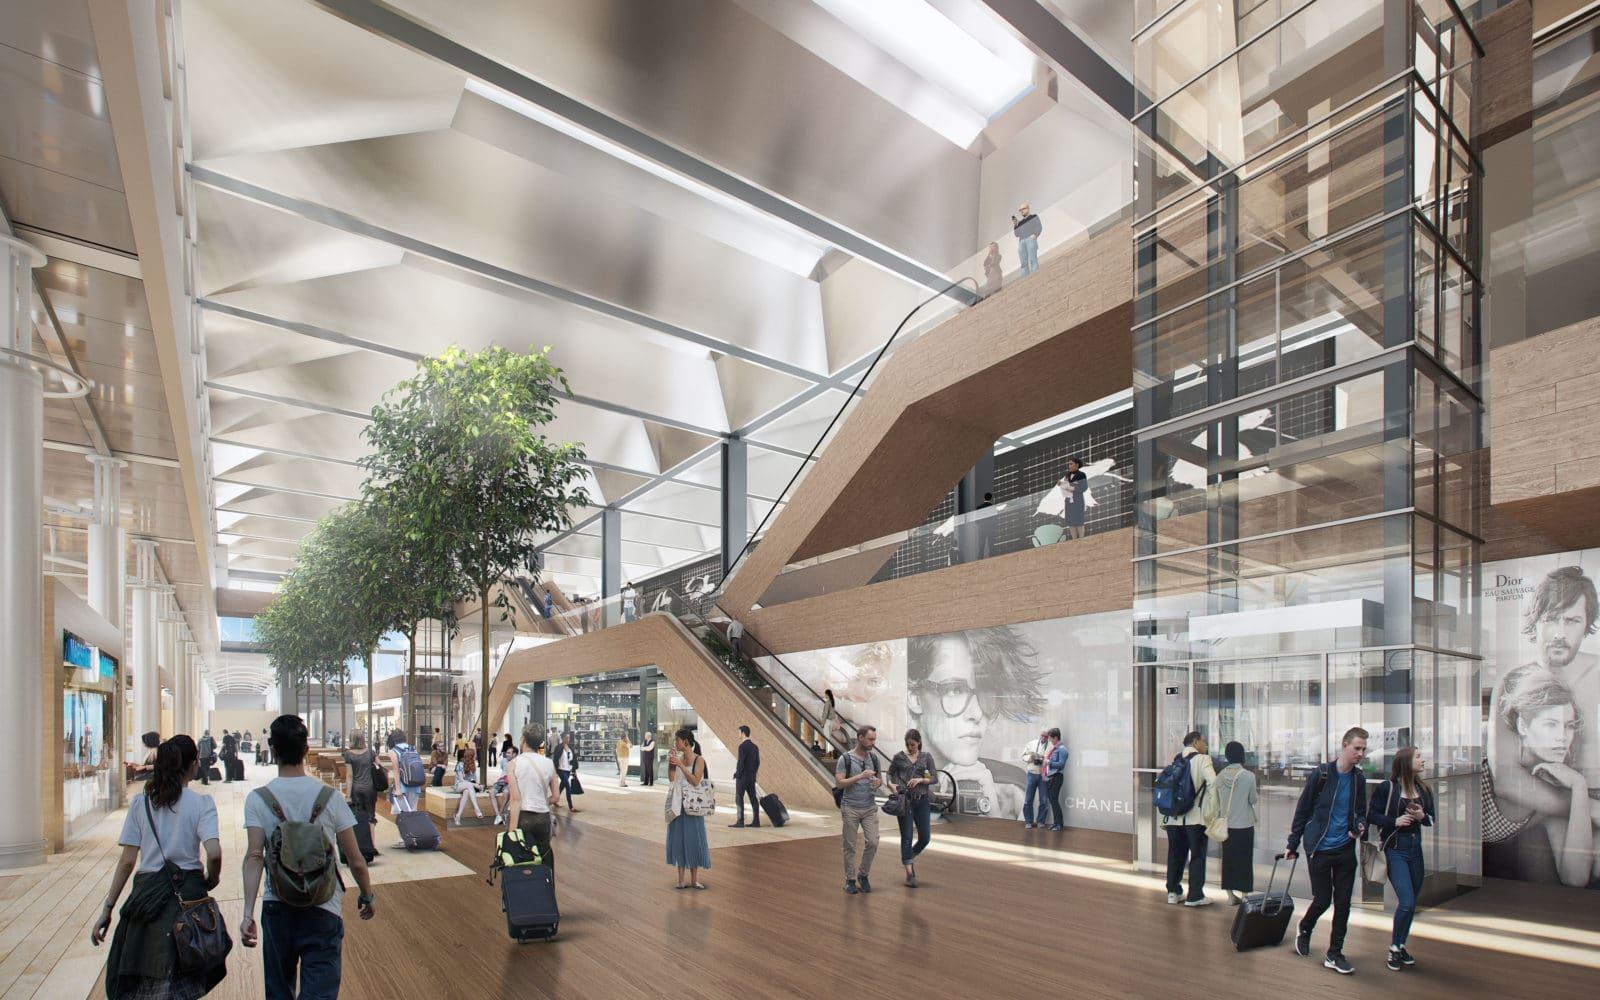 aeroport marseille extension foster 14